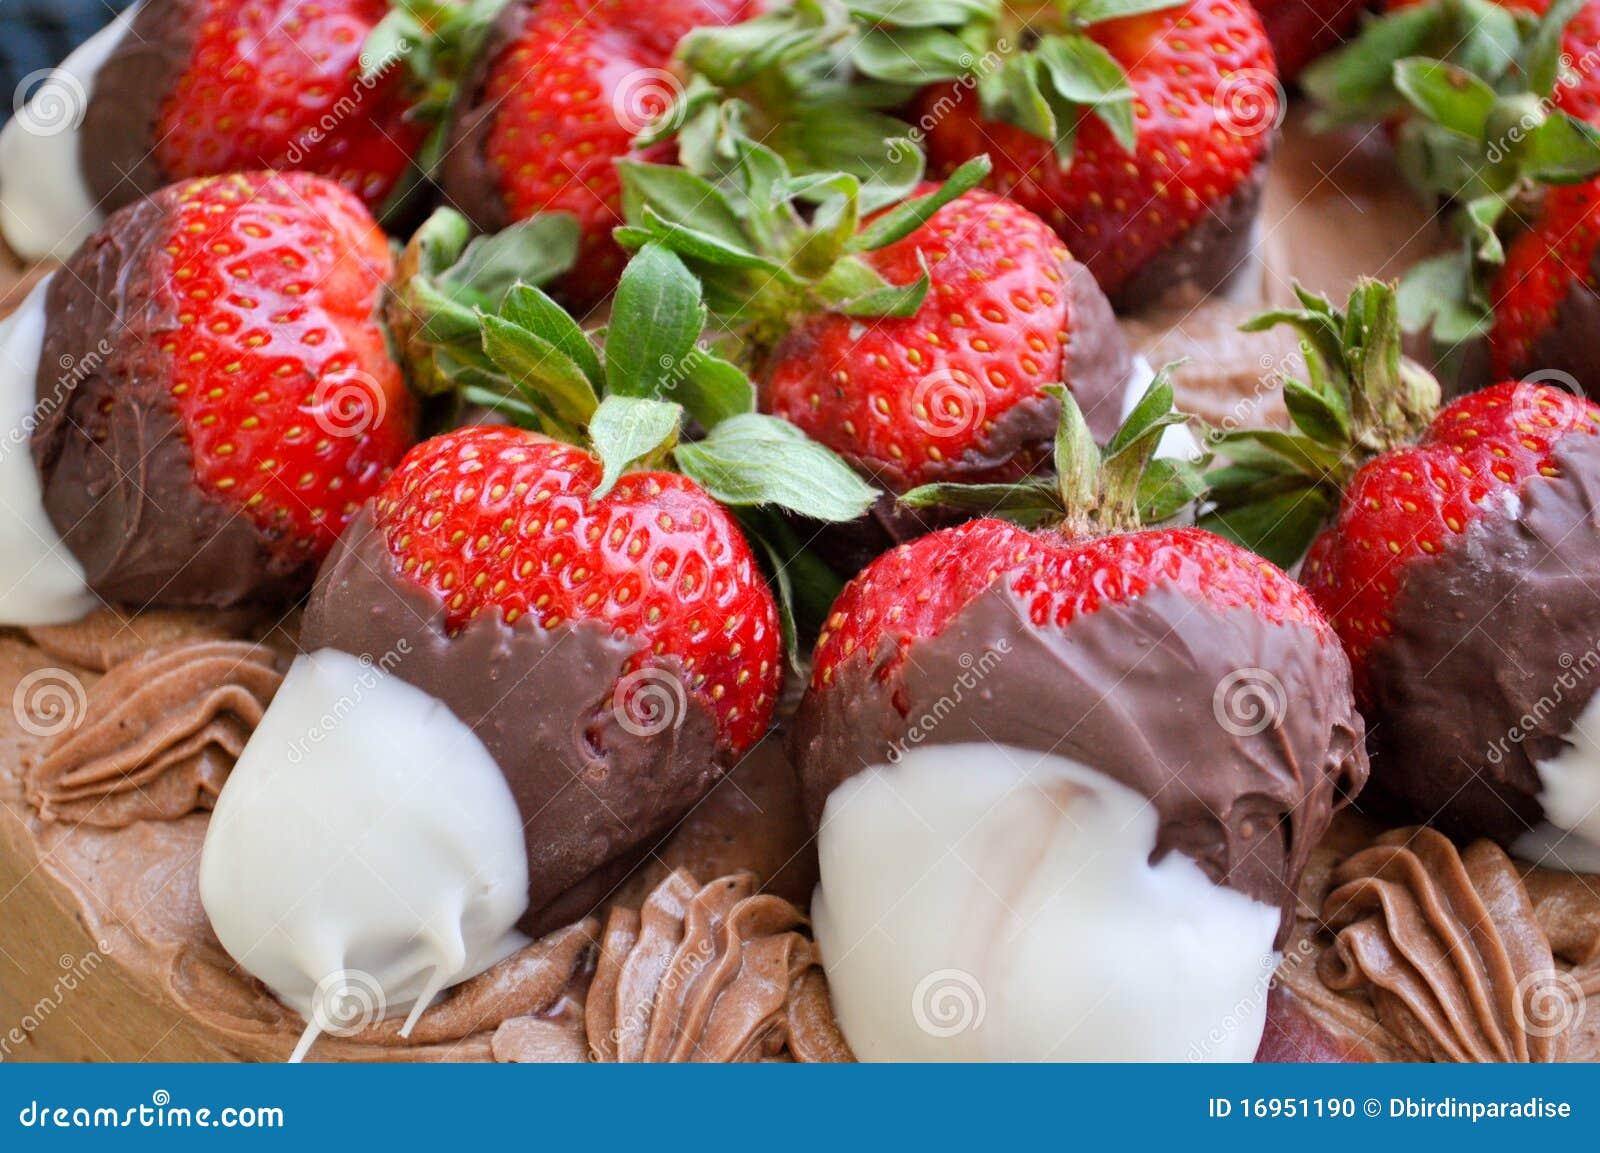 Chocolate Covered Strawberries Stock Photo - Image: 16951190